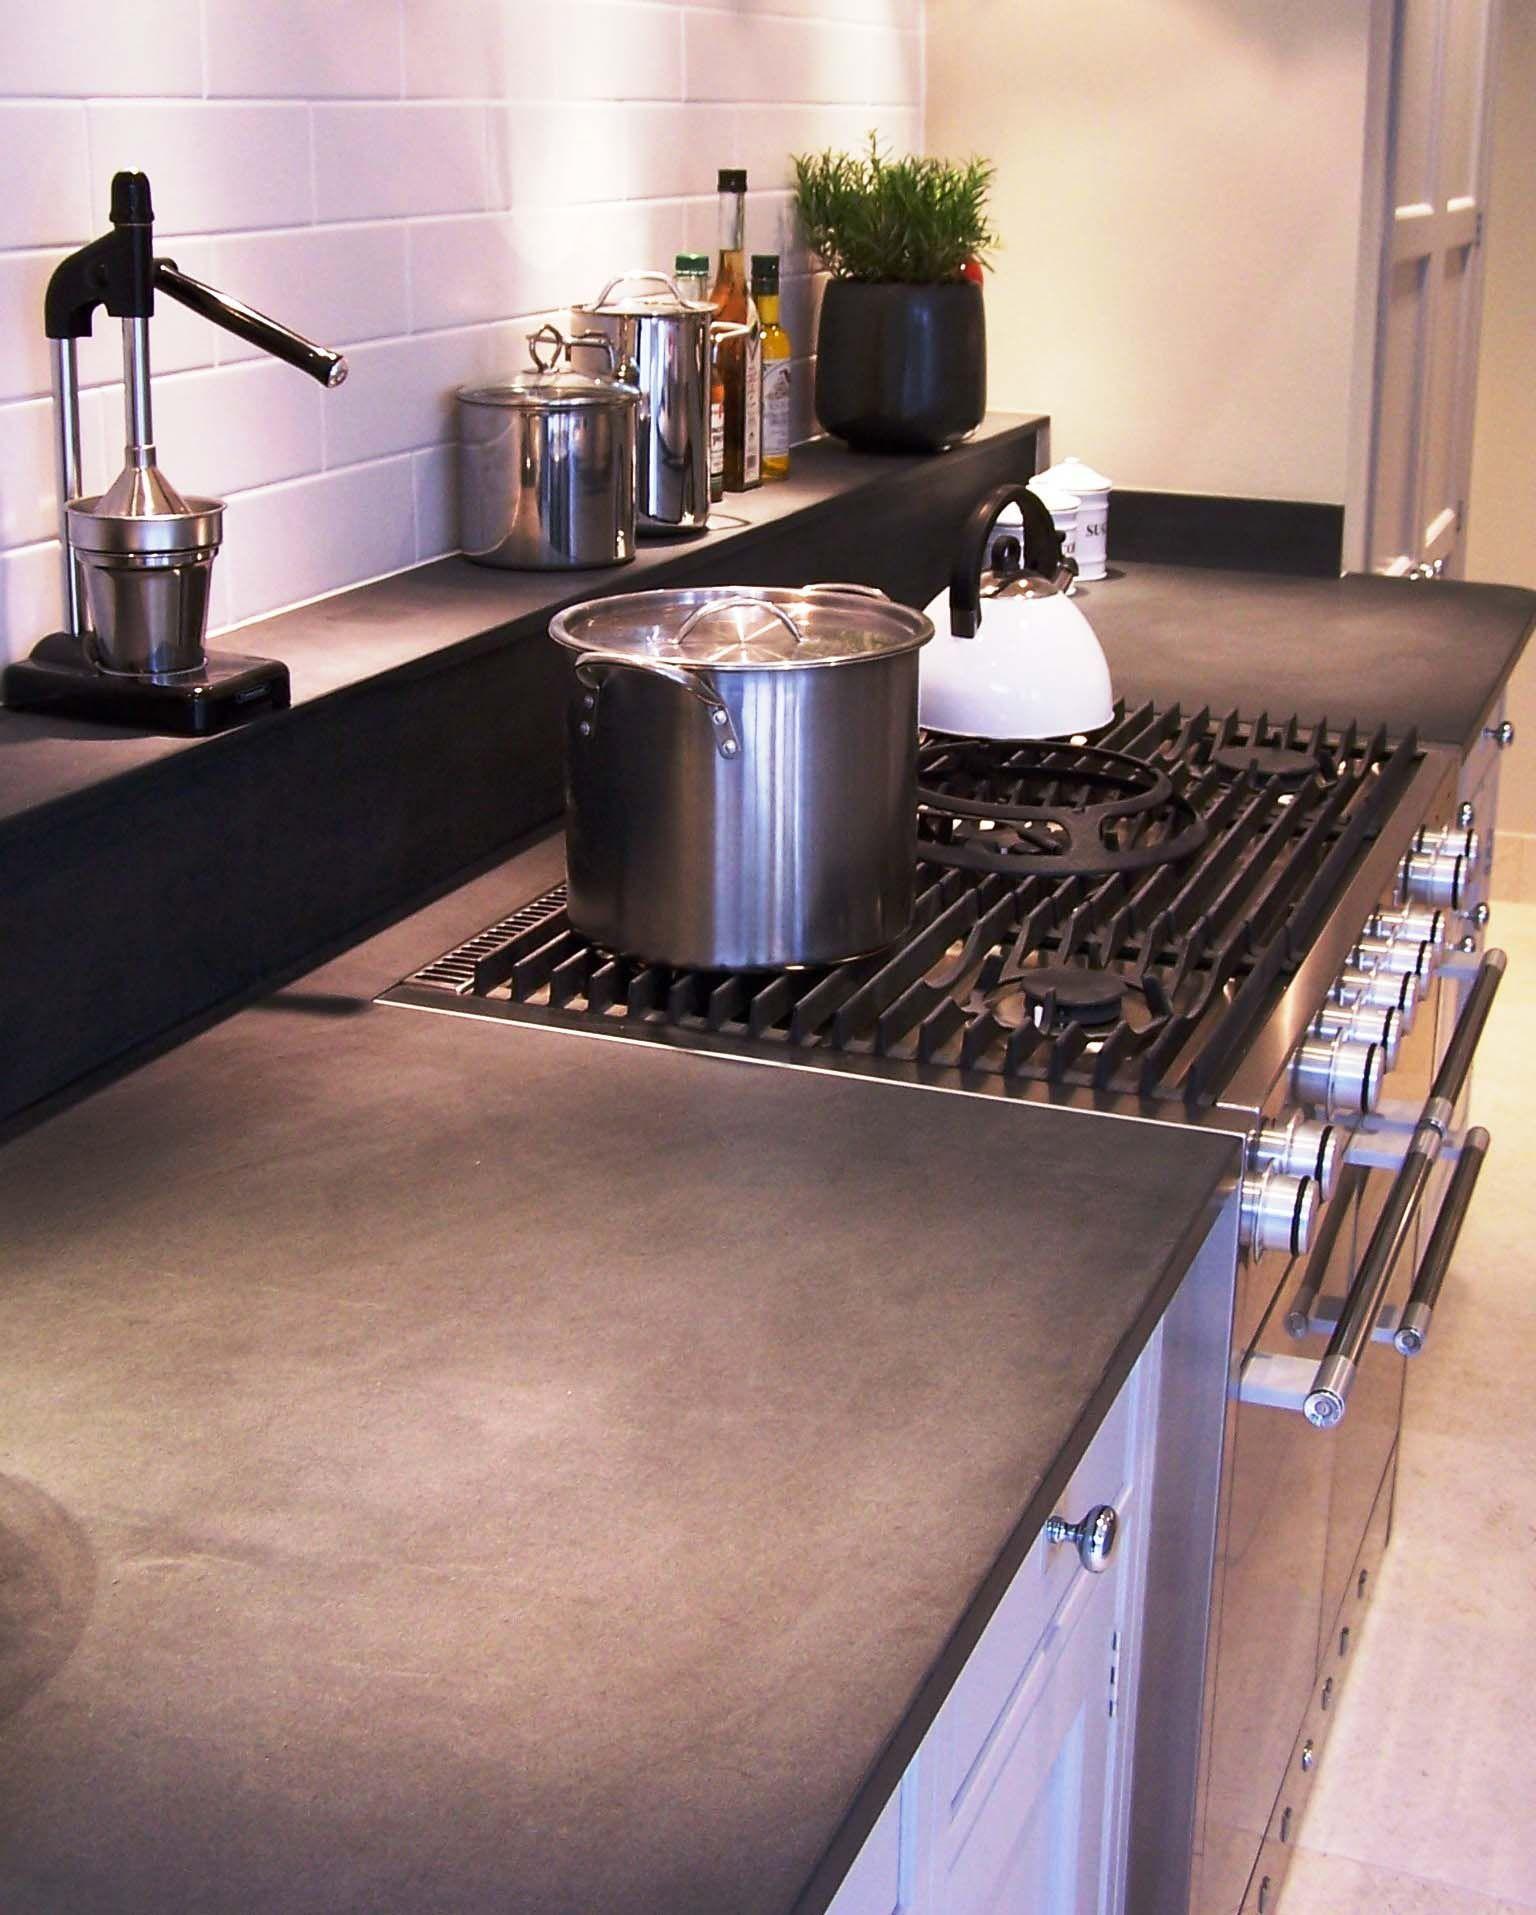 This Honed Nero Assoluto Granite Supplied By Worktopenvy Com Brings Understated Chic To Any Kitchen Kuche Schiefer Fliesen Schiefer